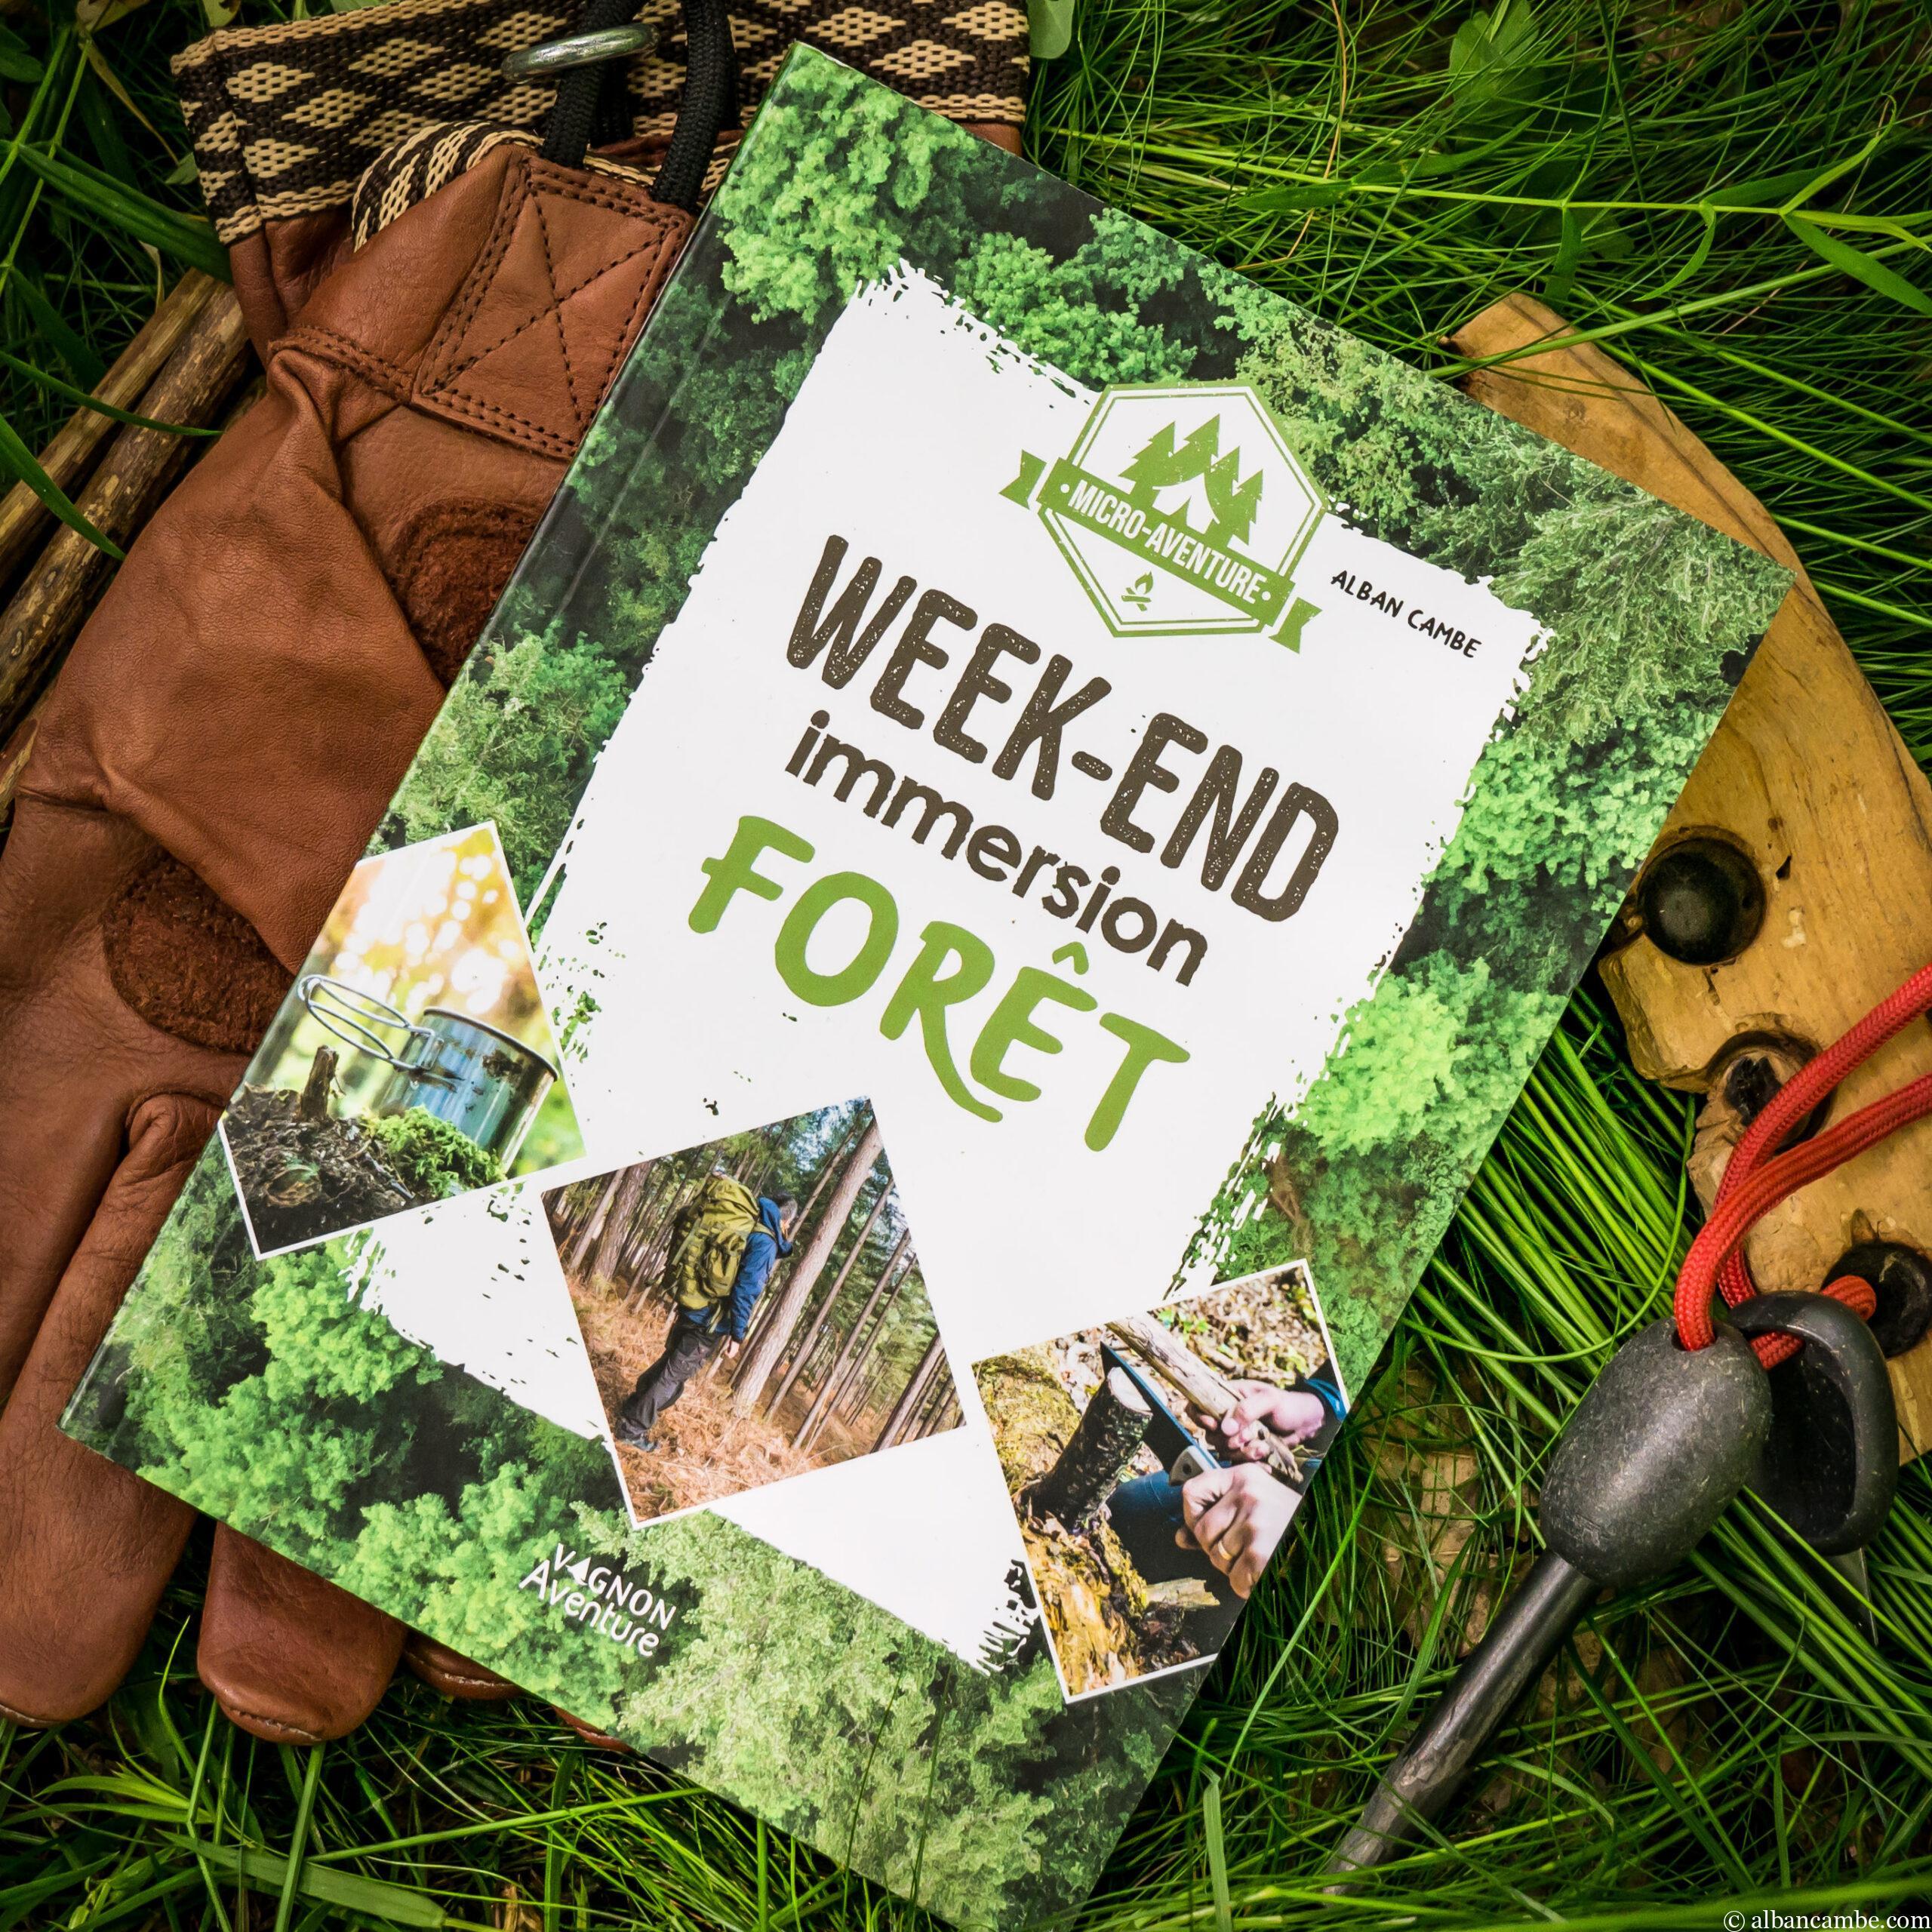 Le guide du bivouac : microaventure – week-end immersion forêt